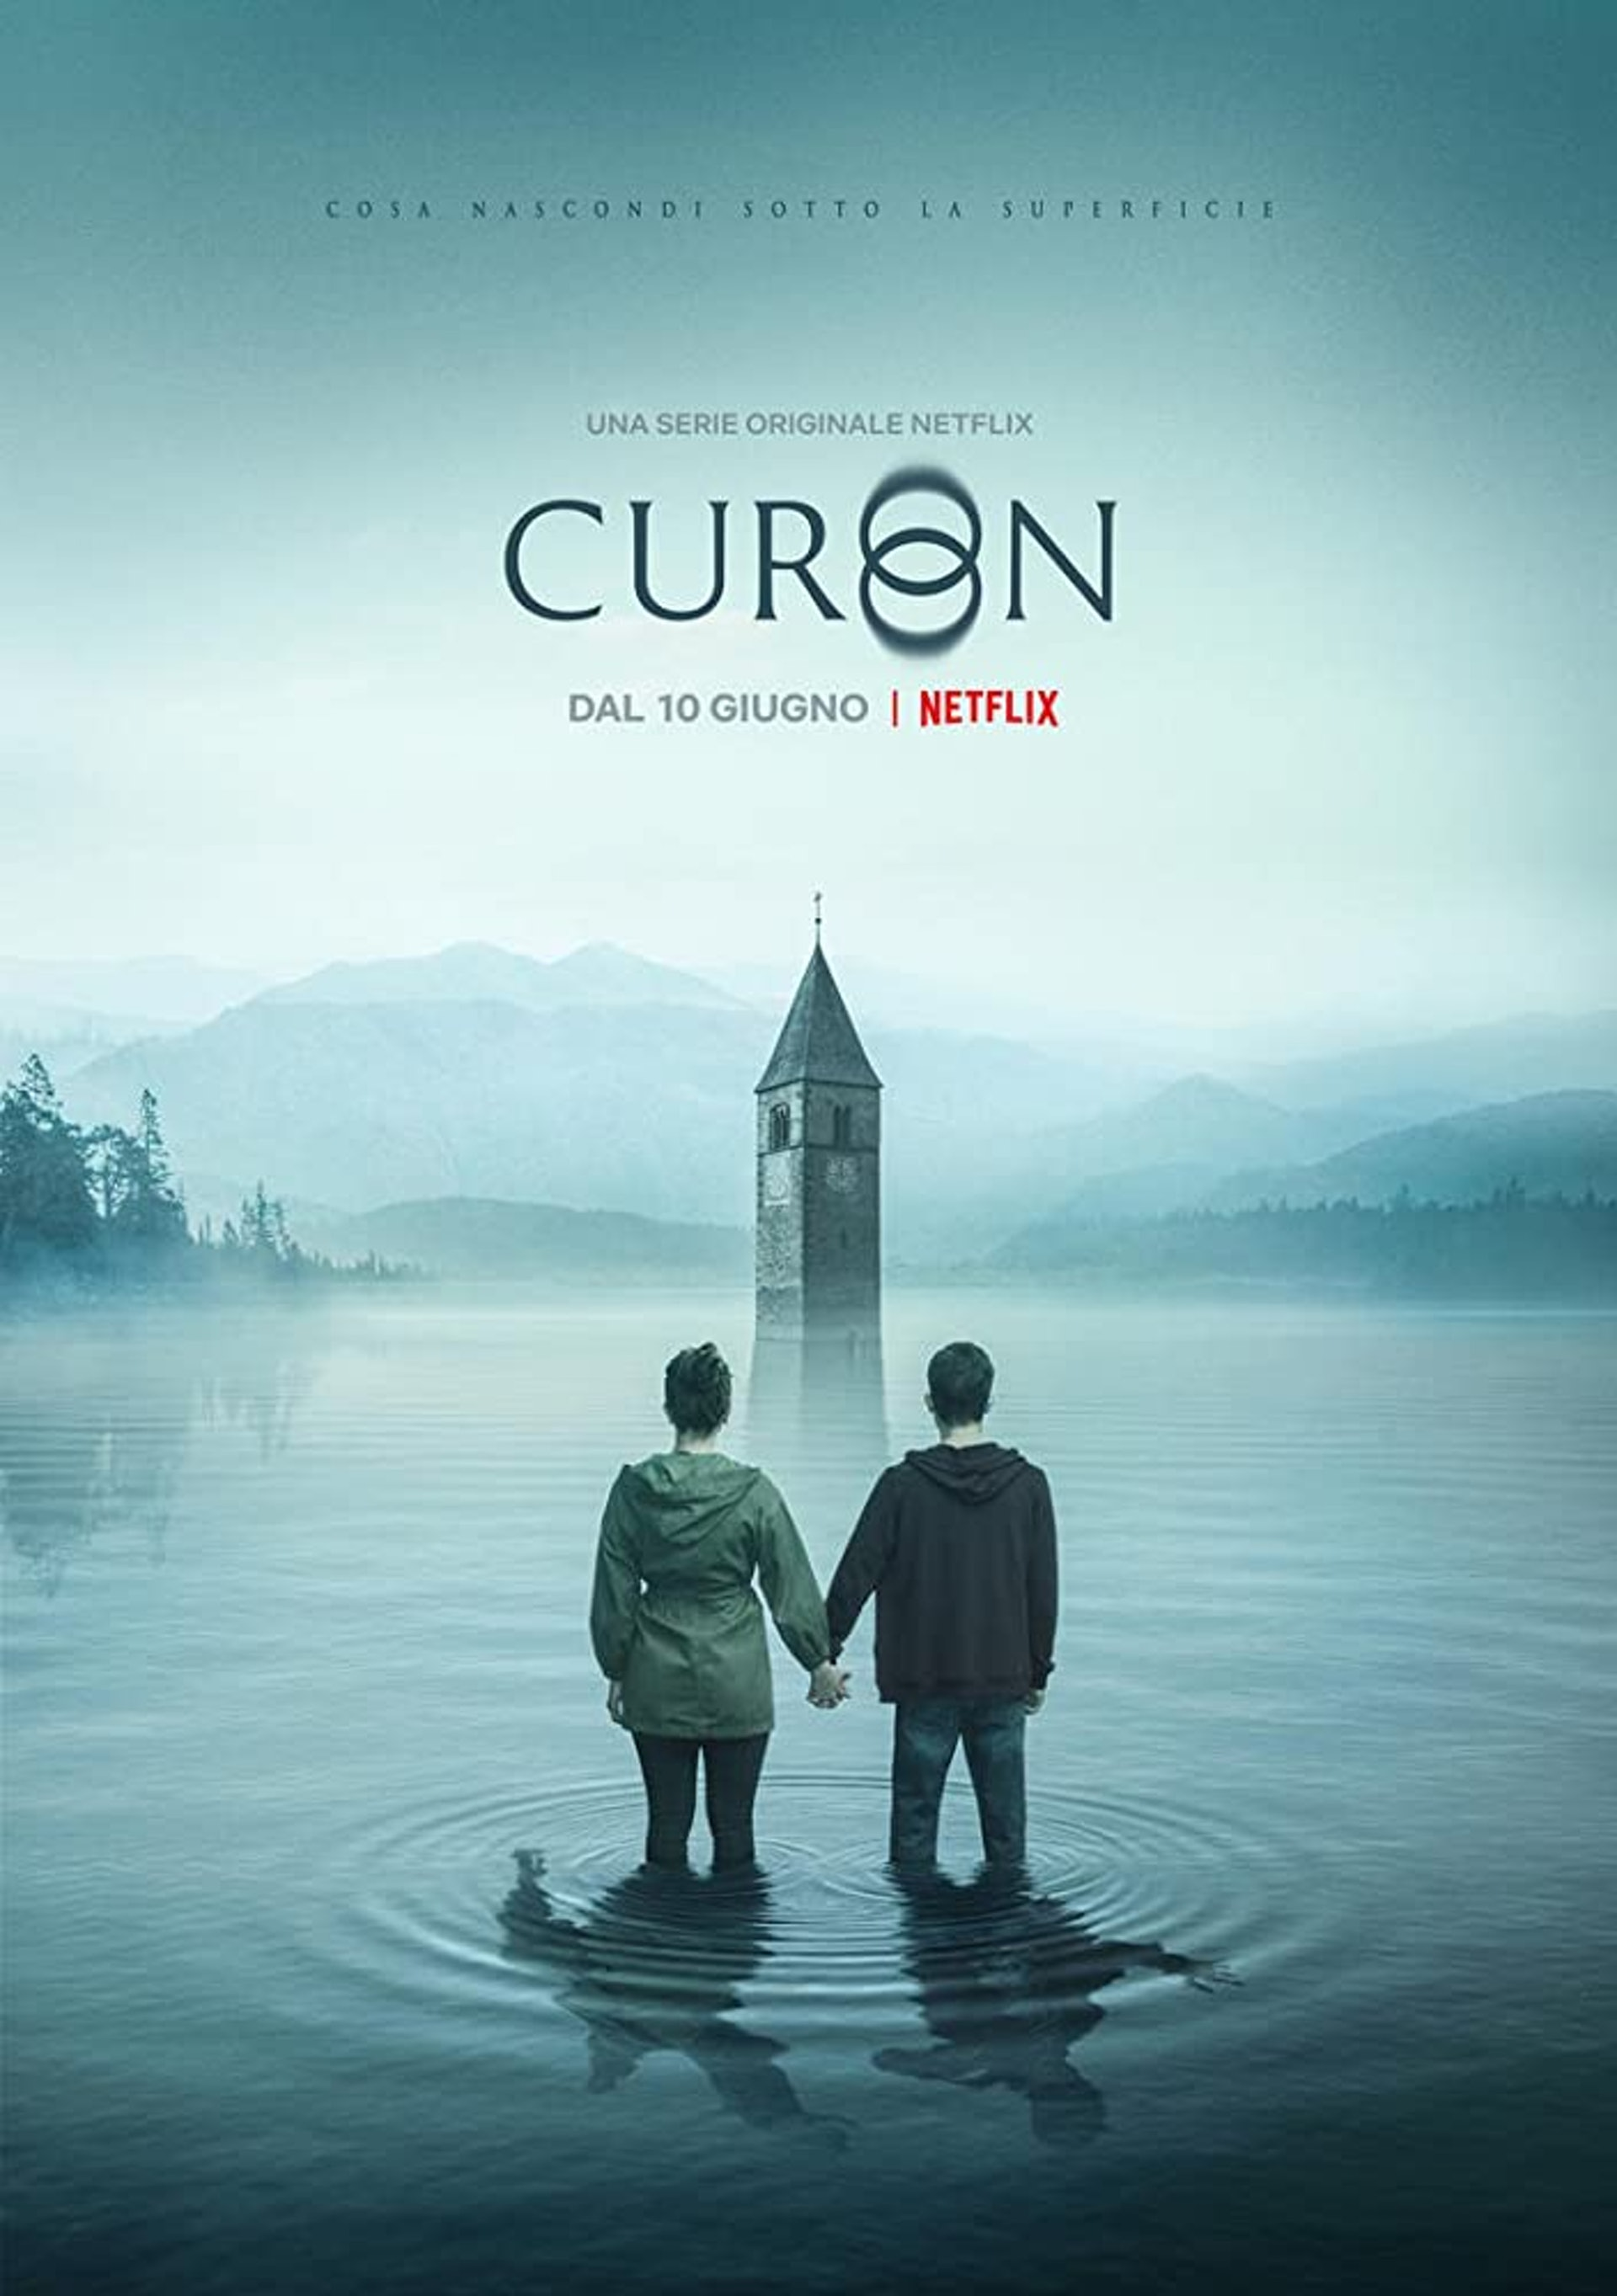 《Curon》於6月10日在Netflix上架。(劇集海報)